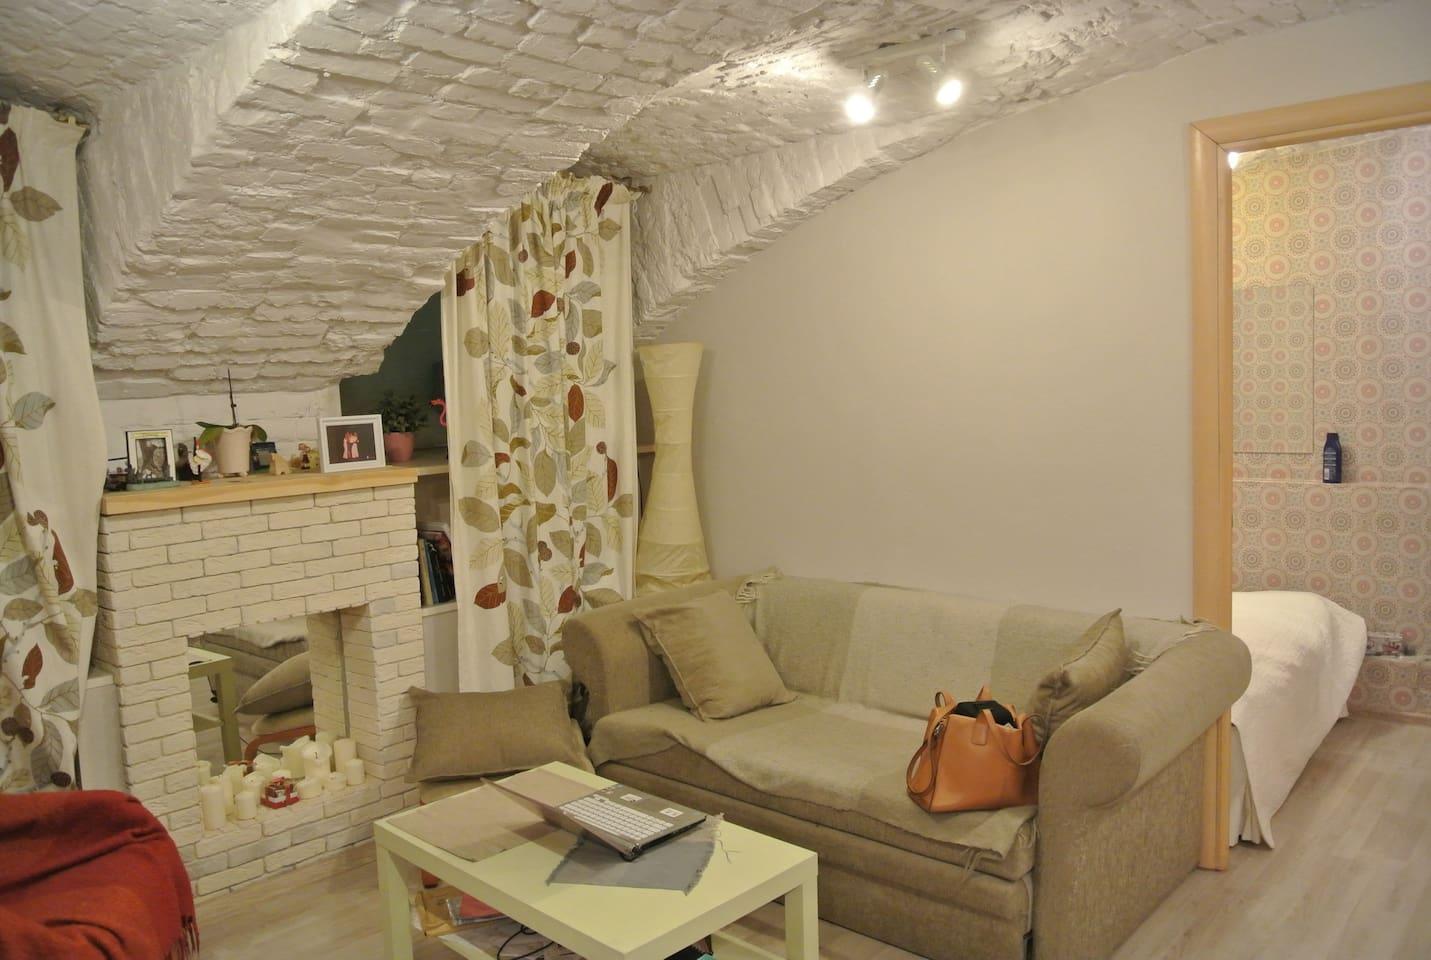 Кухня-гостинная с 2-х местным раскладным диваном